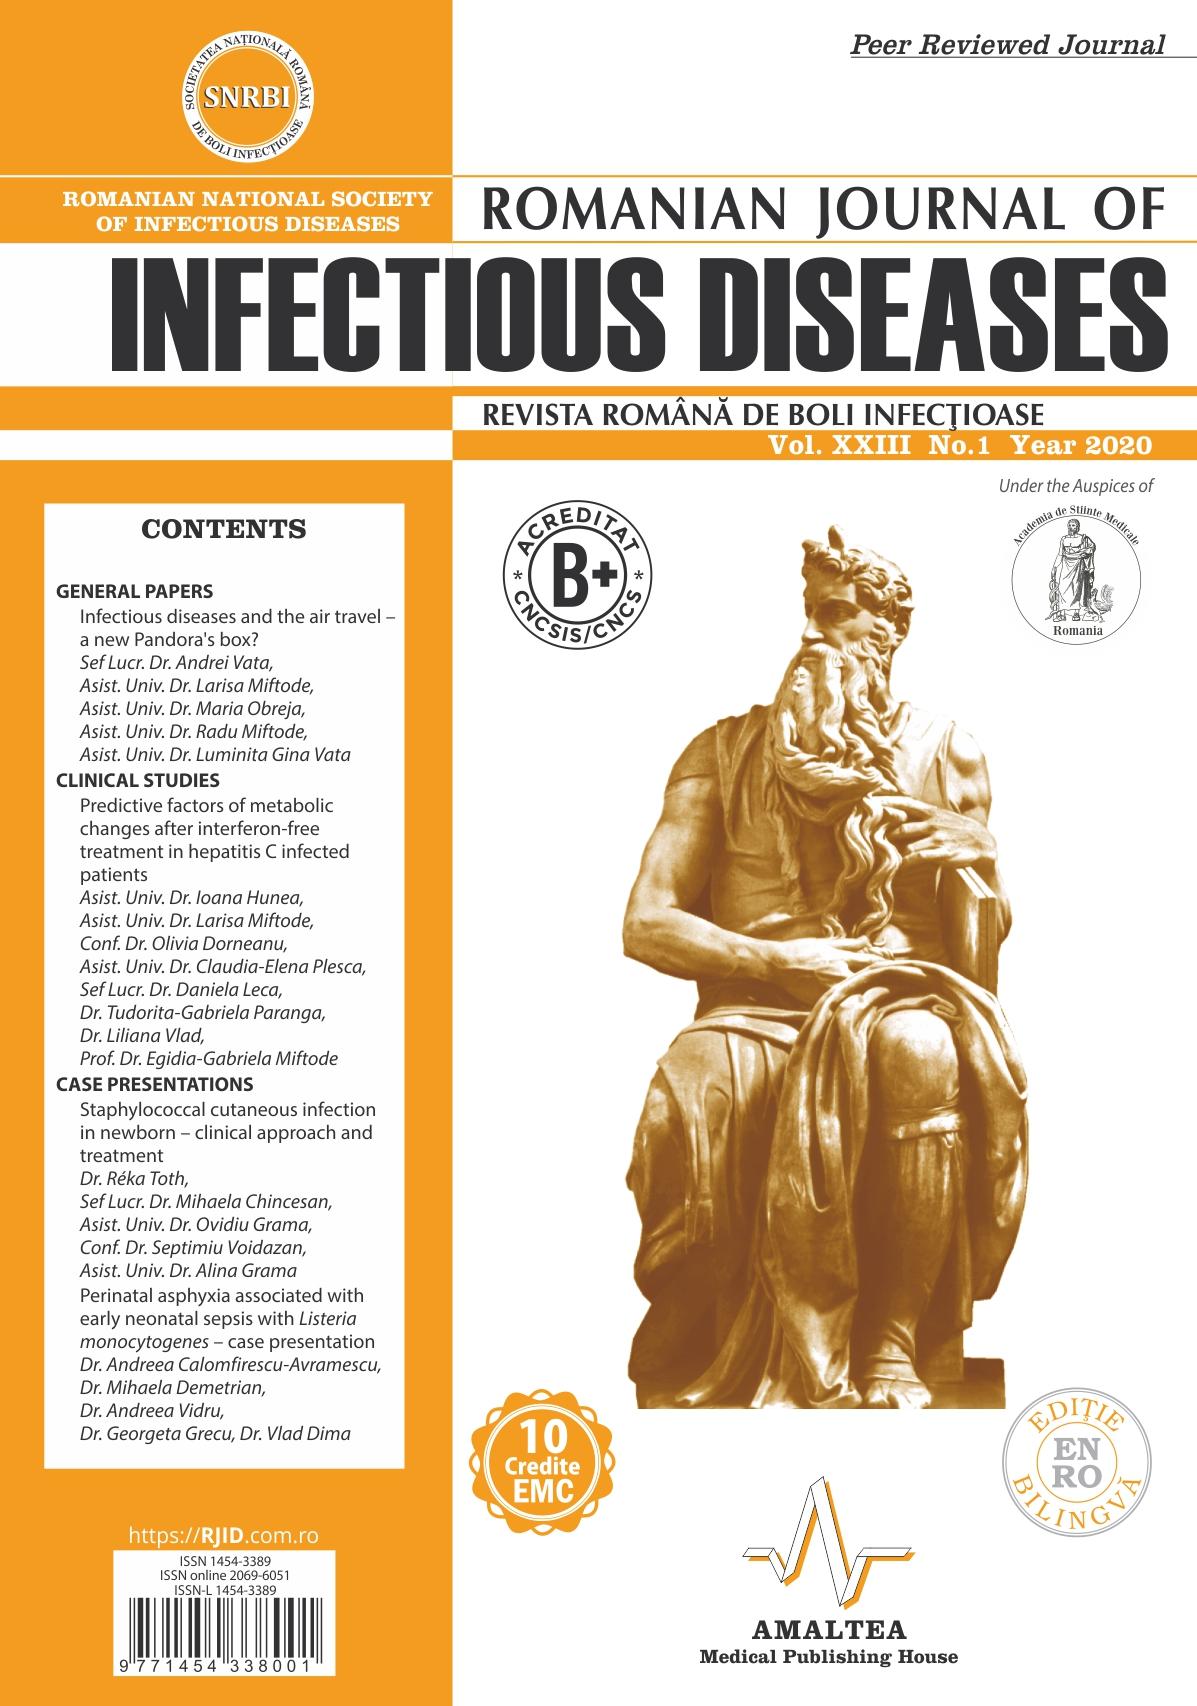 Revista Romana de Boli Infectioase | Vol. XXIII, No. 1, 2020